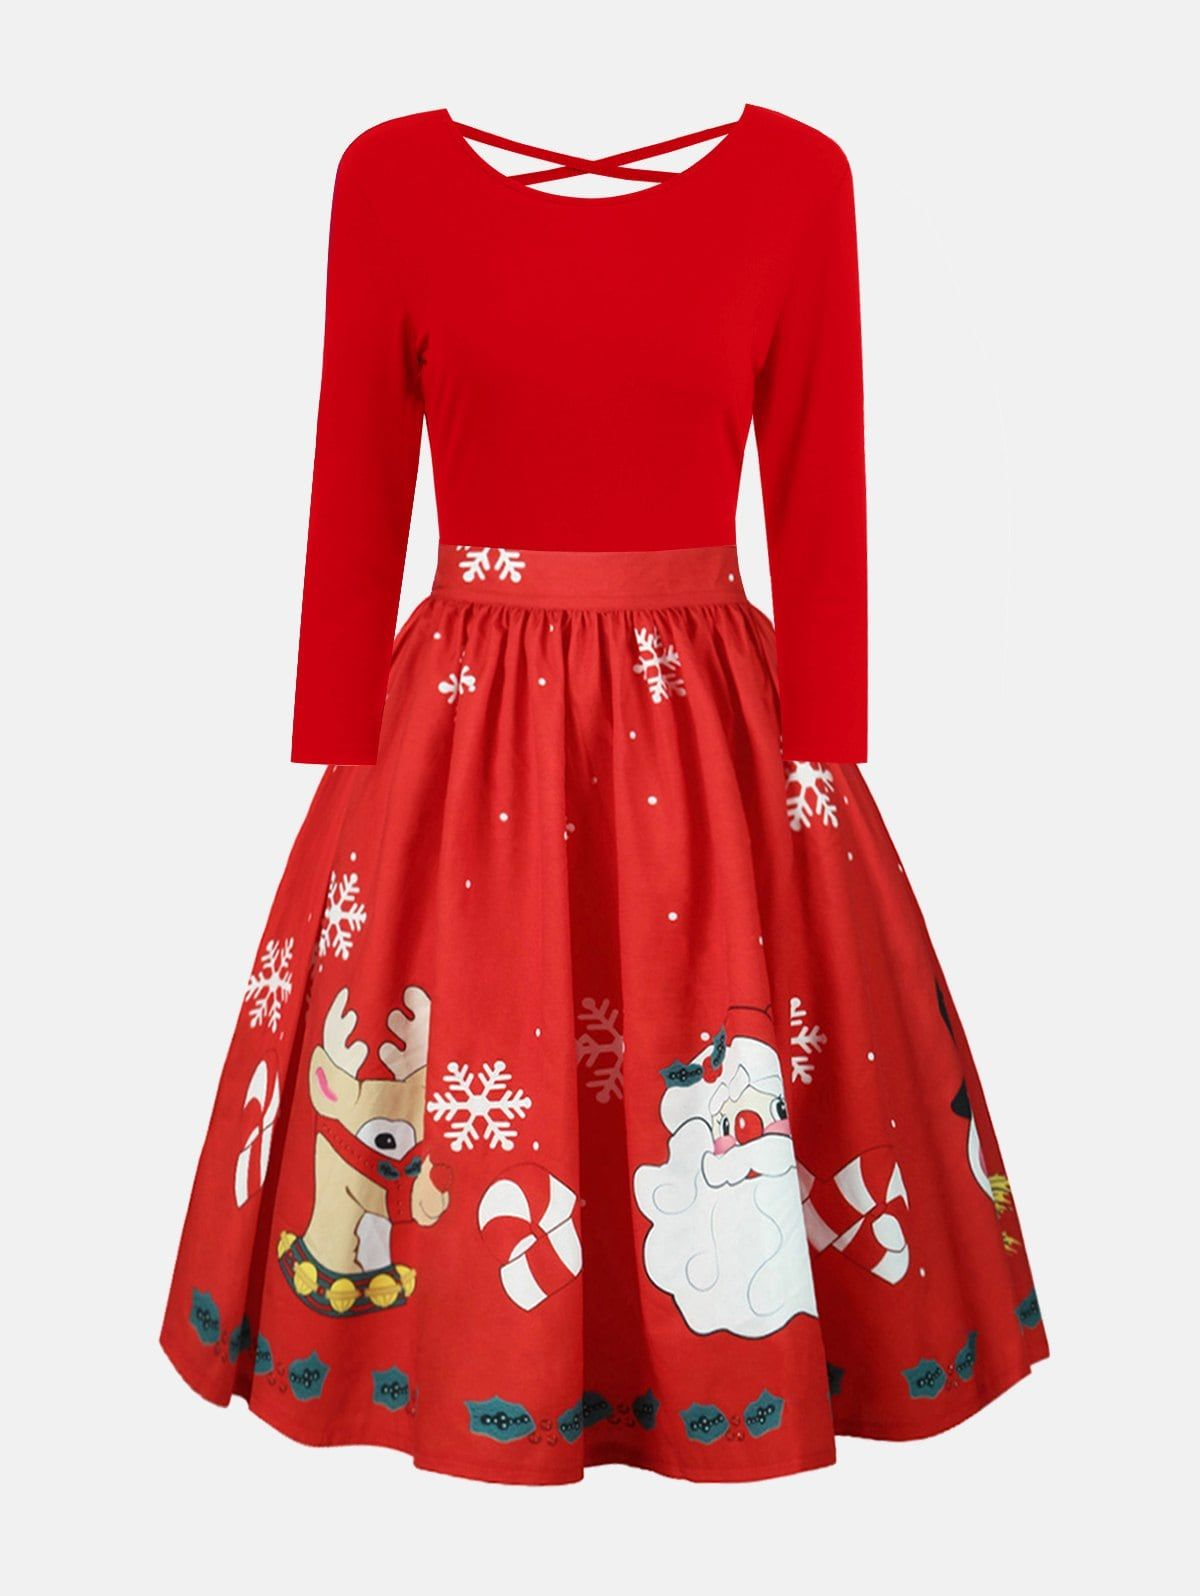 e70edfcf0c Plus Size Christmas Criss Cross Print Dress   Merry Christmas ...